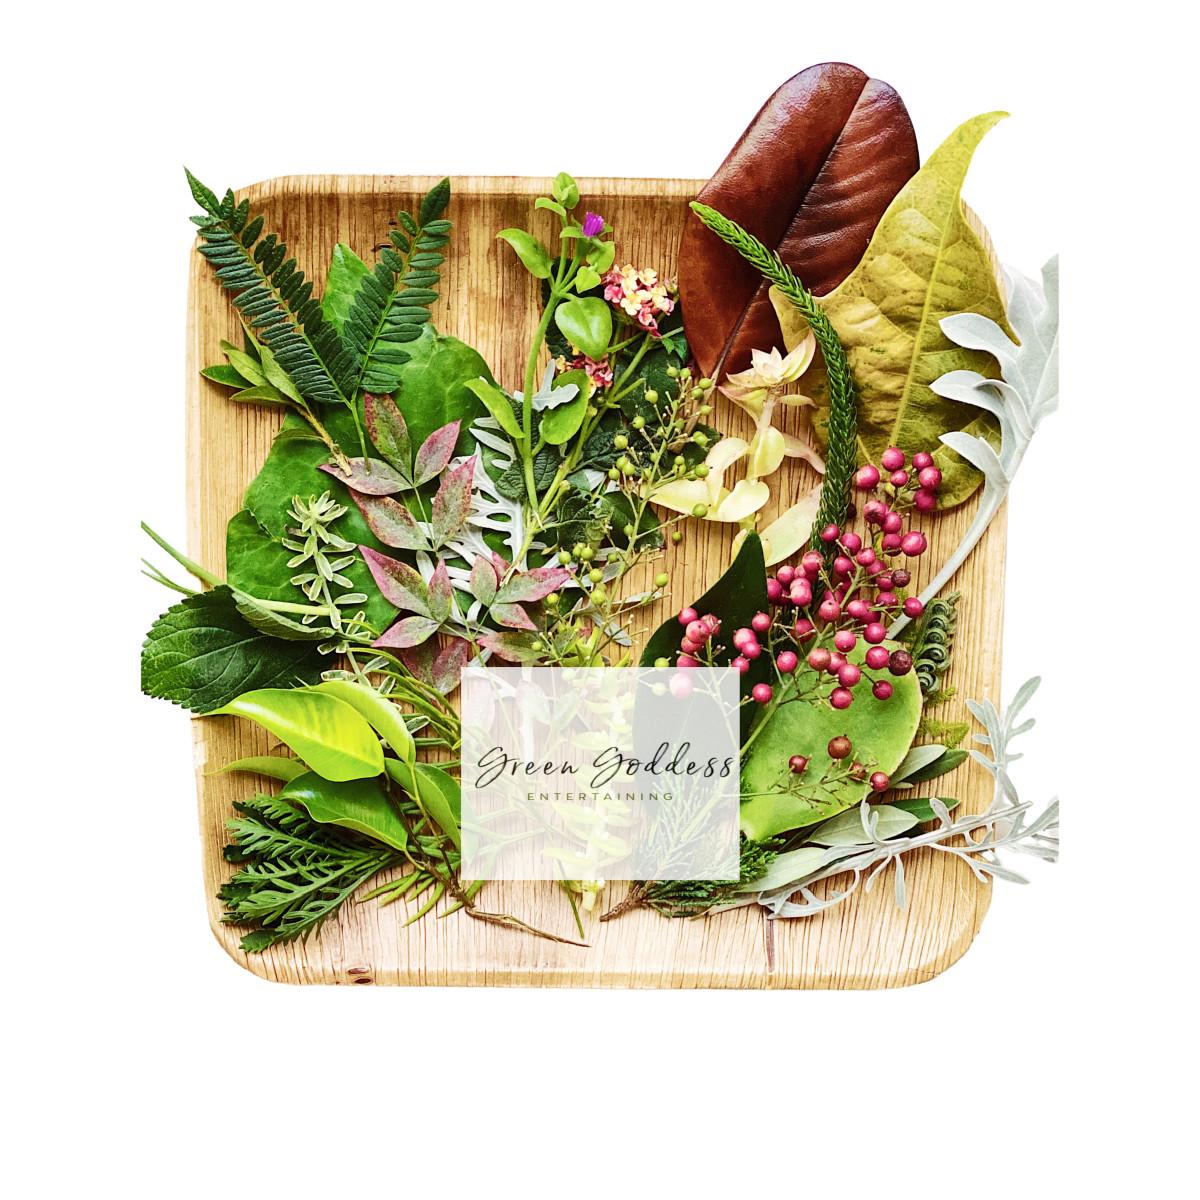 Eco-Friendly Products - Palm Leaf Plates